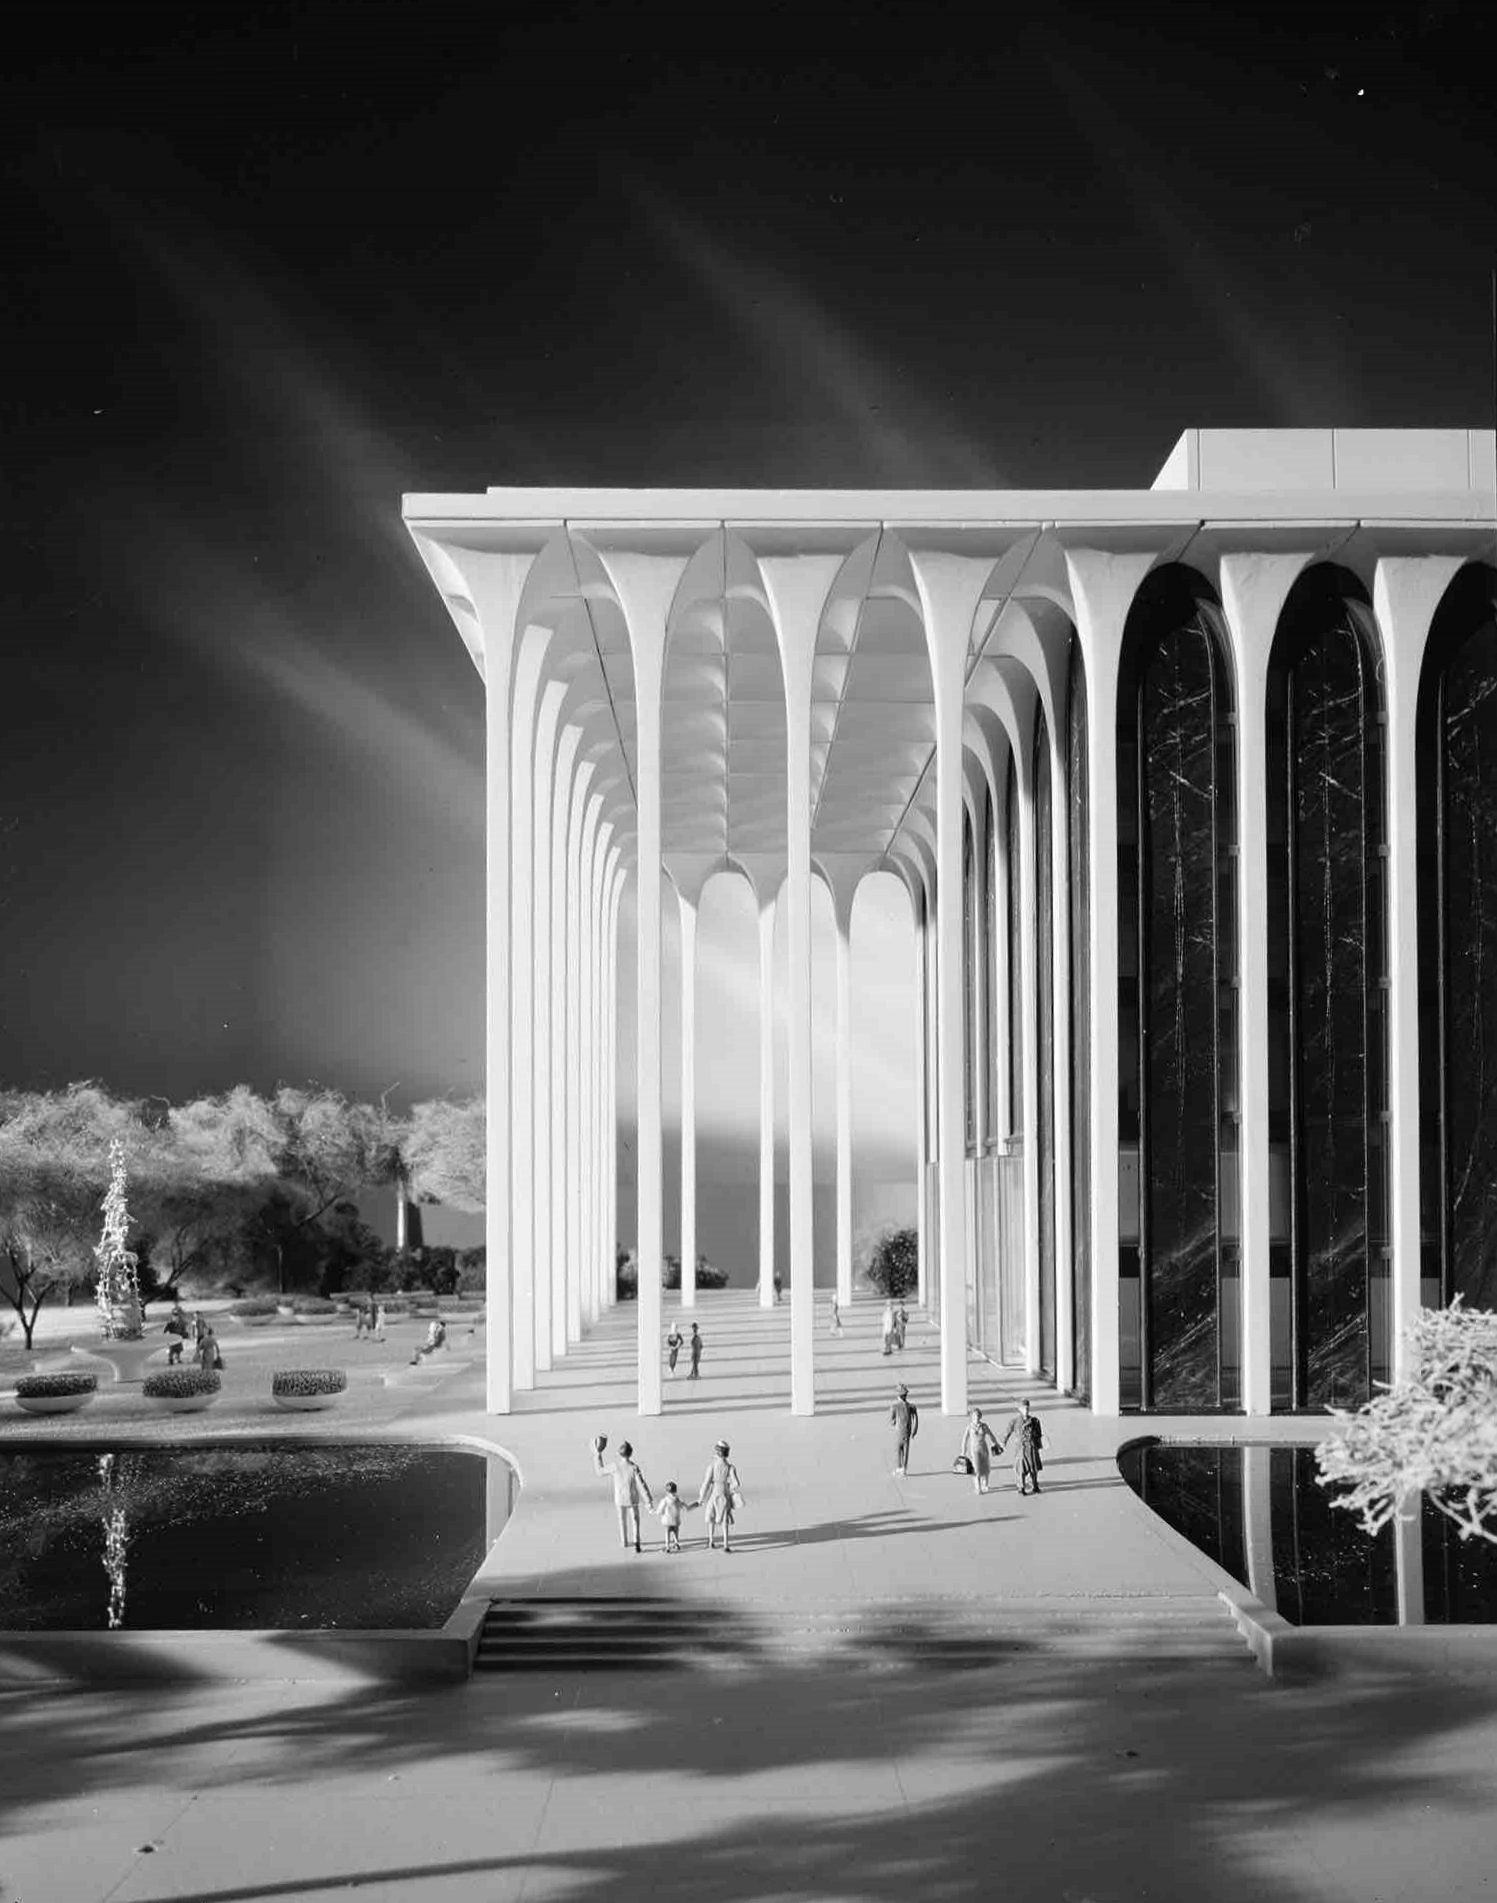 Minoru Yamasaki, Northwestern National Life Building (Minneapolis, MN) 1964